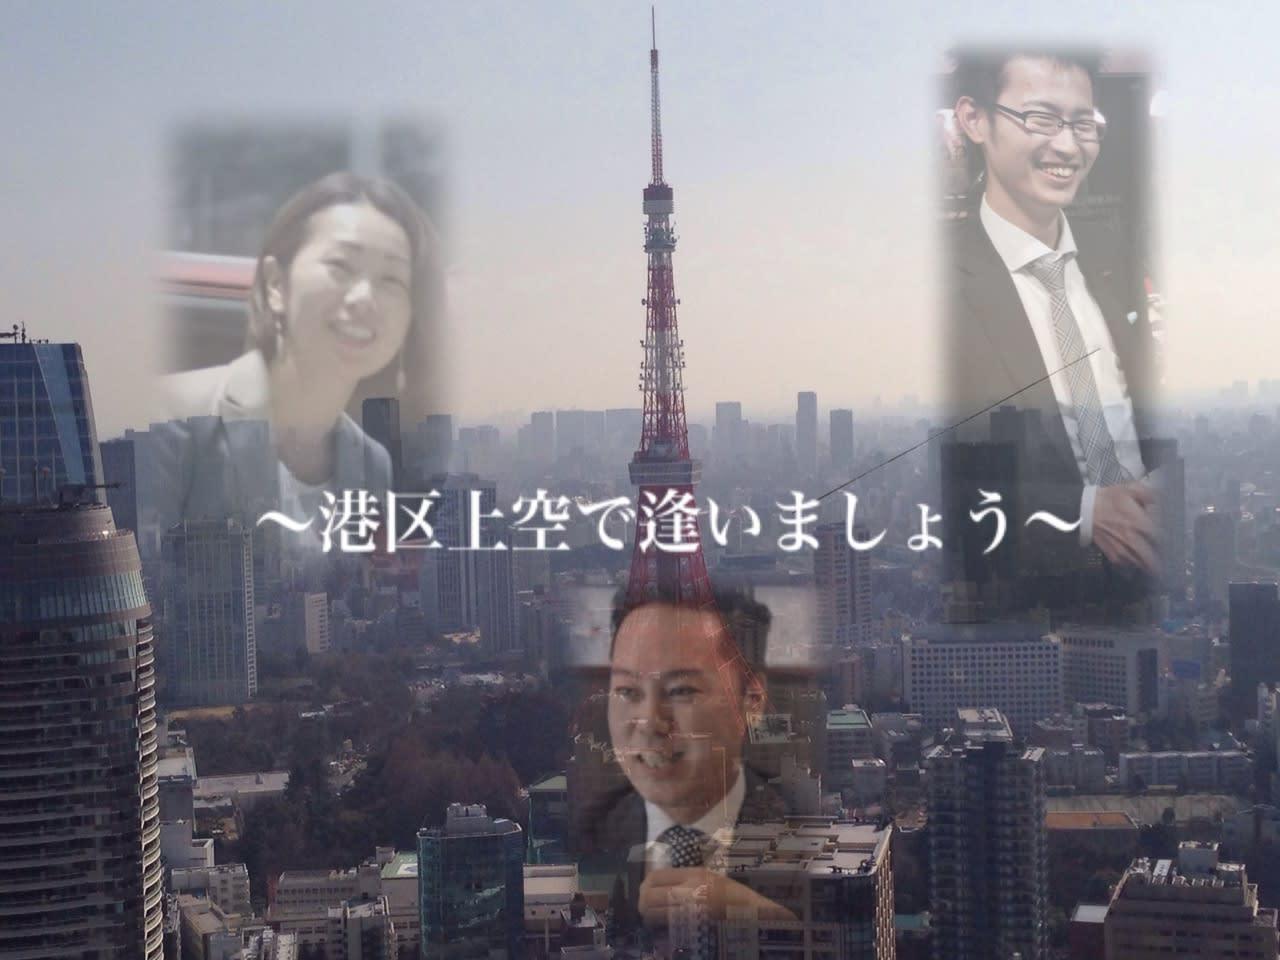 http://www.axel-home.com/access/shinbashi.html